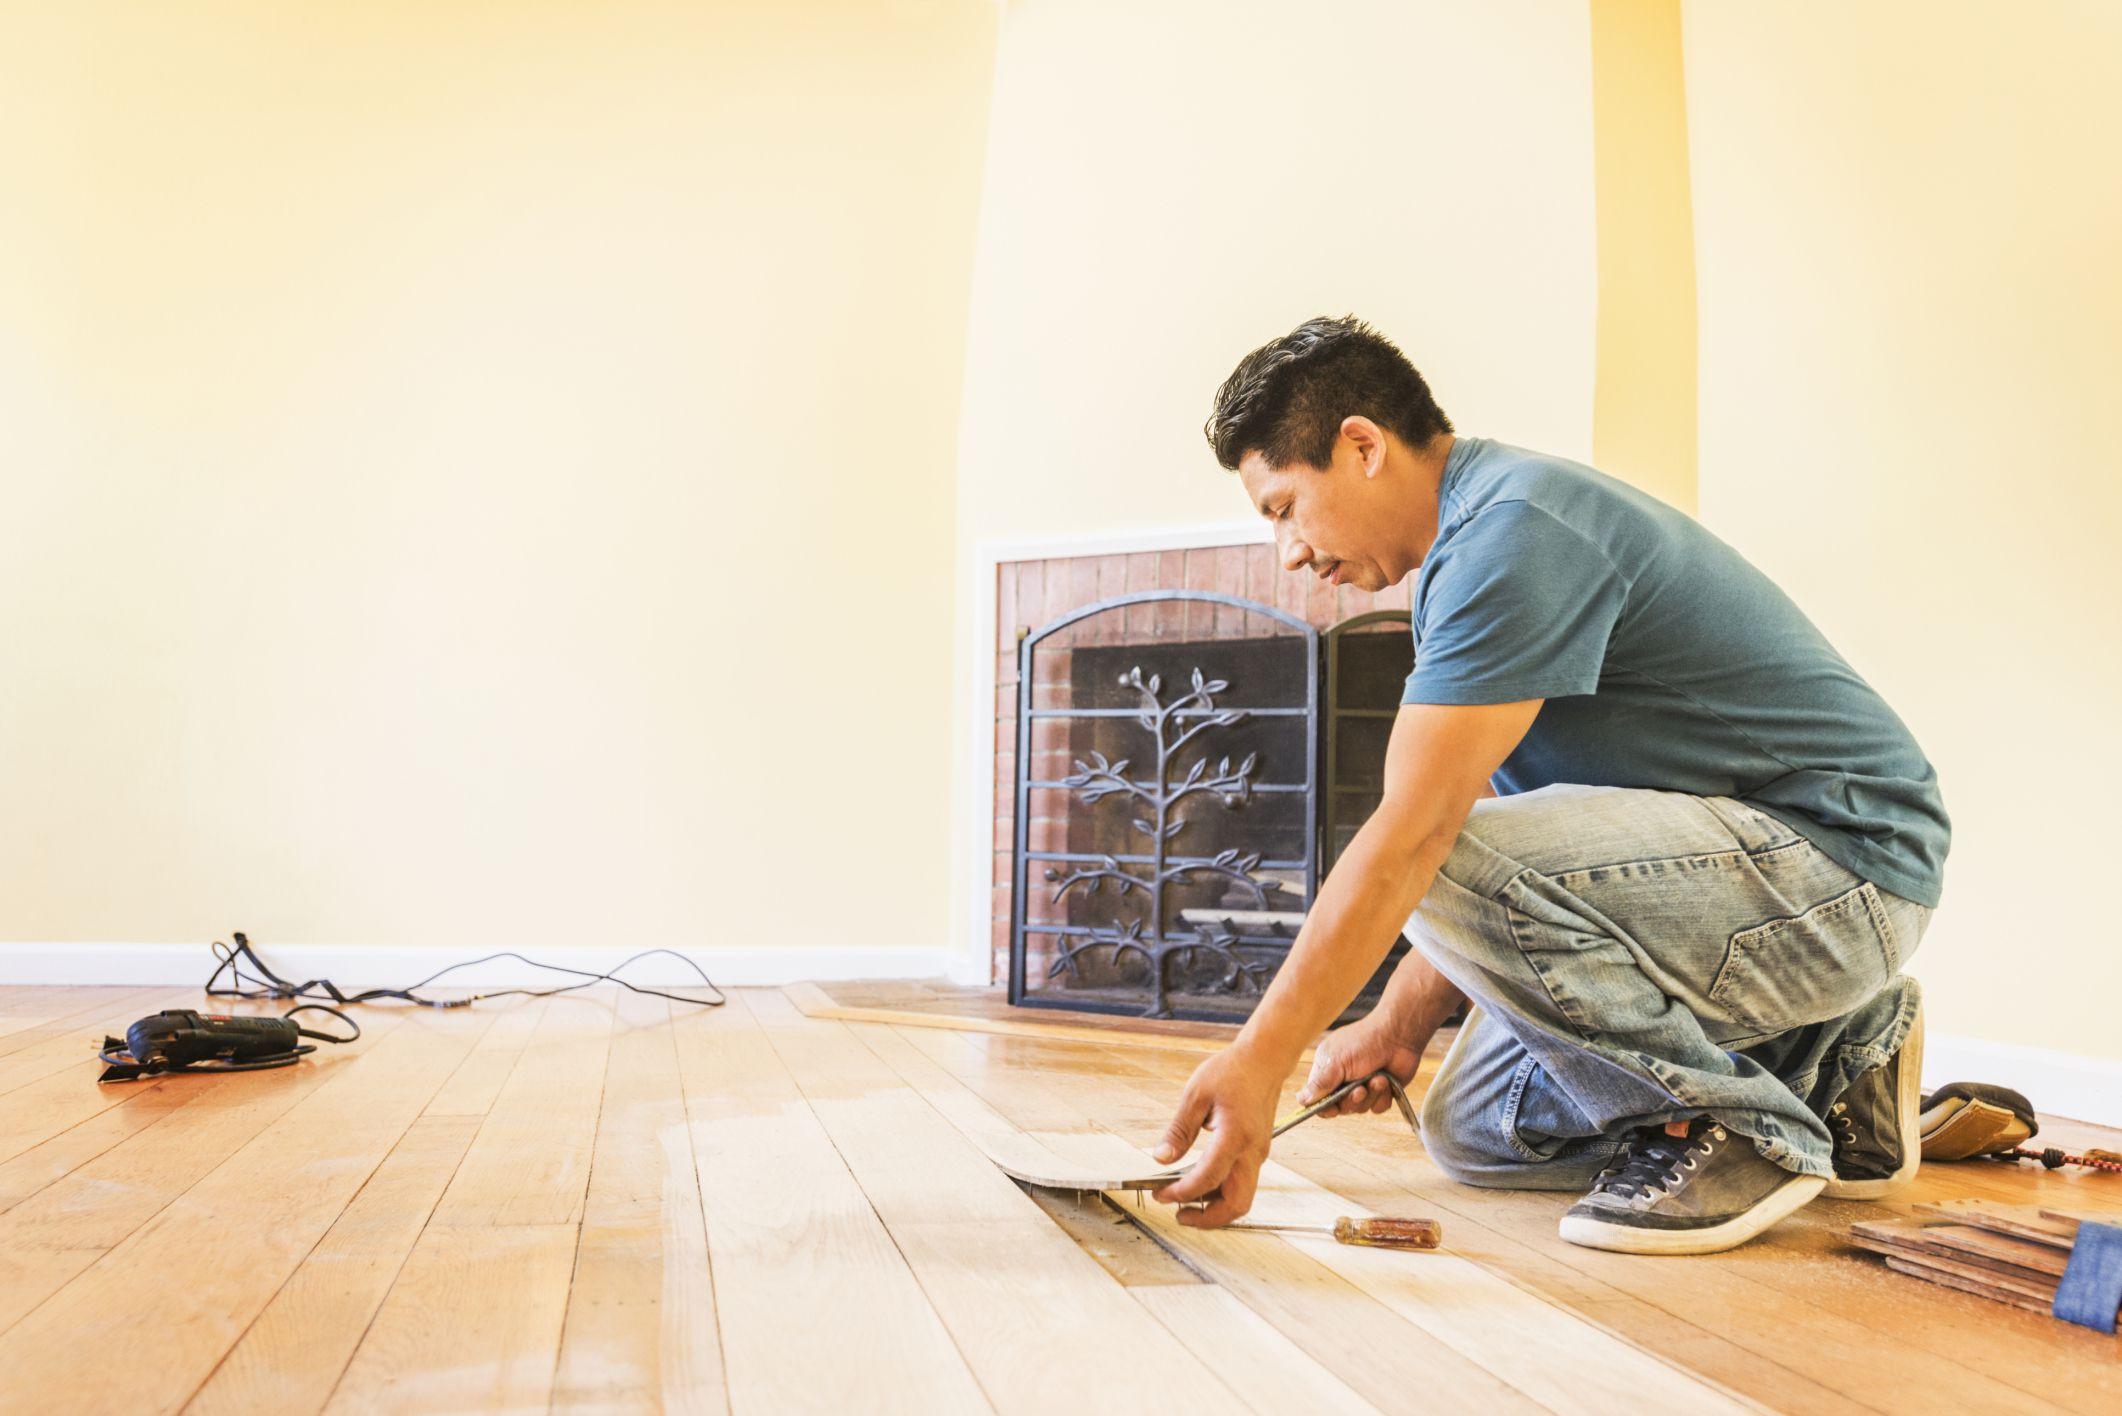 hardwood floor cost estimator of solid hardwood flooring costs for professional vs diy regarding installwoodflooring 592016327 56684d6f3df78ce1610a598a